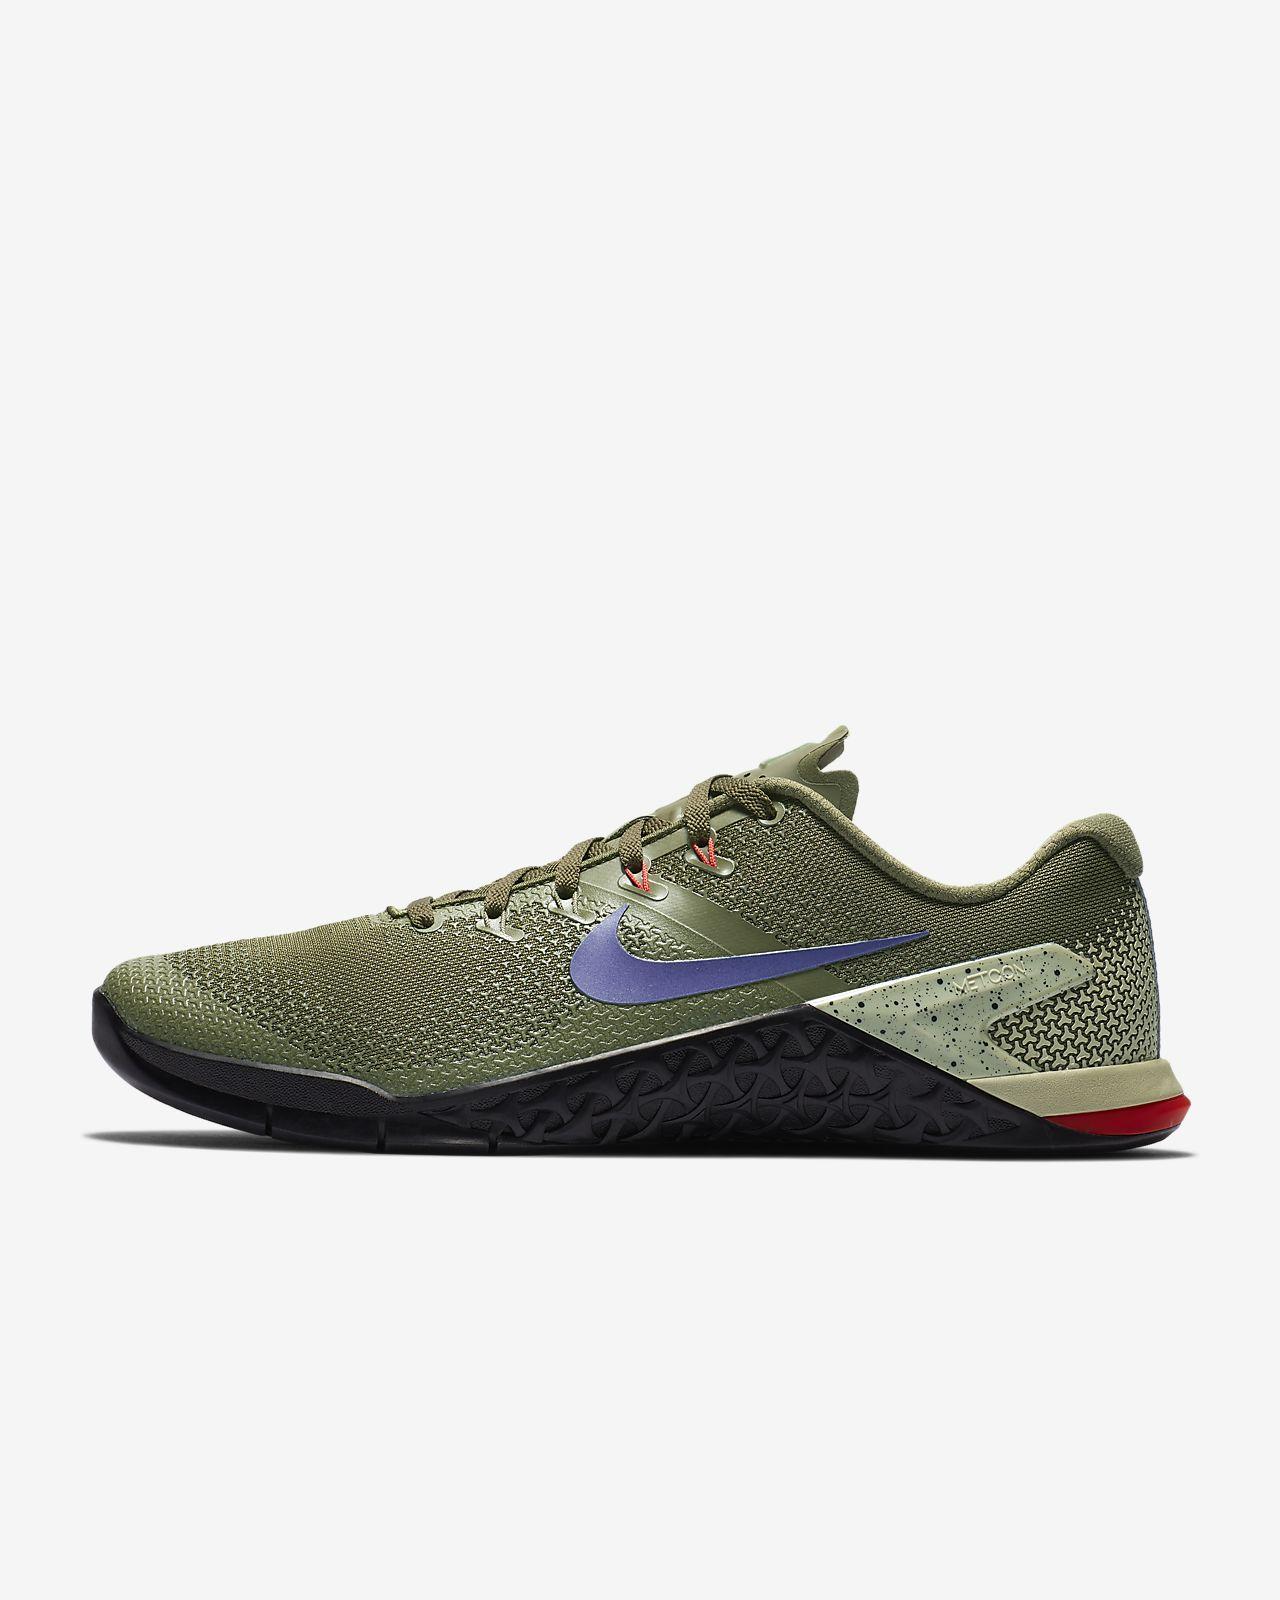 free shipping 36632 20ca4 Mens Cross TrainingWeightlifting Shoe. Nike Metcon 4